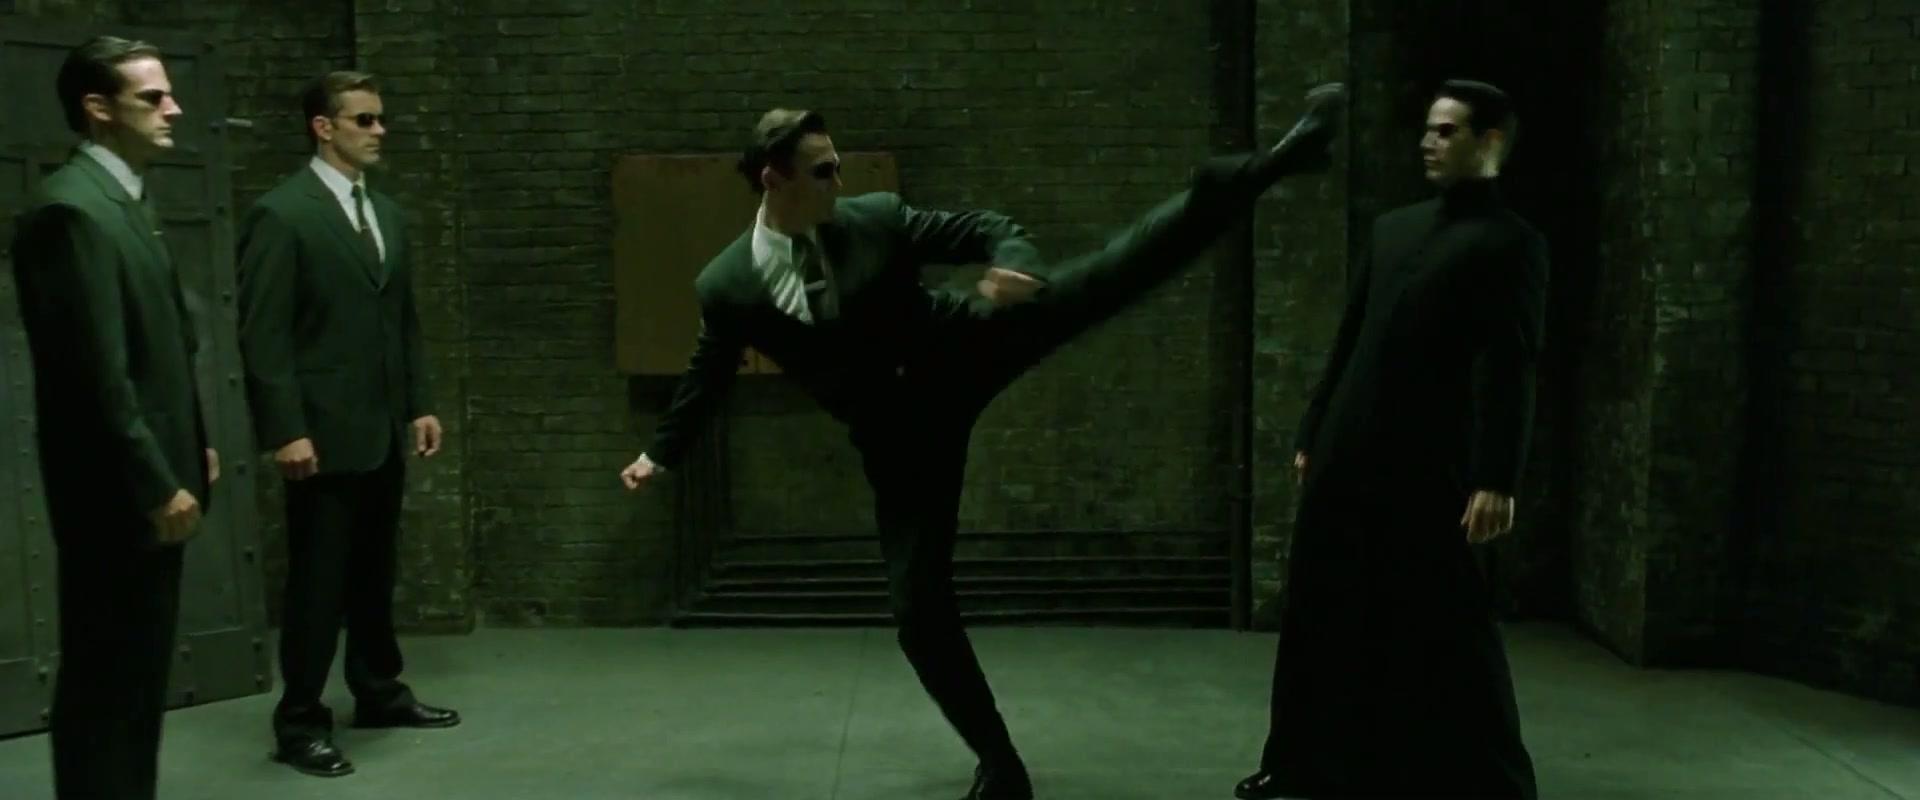 Agent Johnson Matrix Wiki Neo Trinity Wachowski Brothers